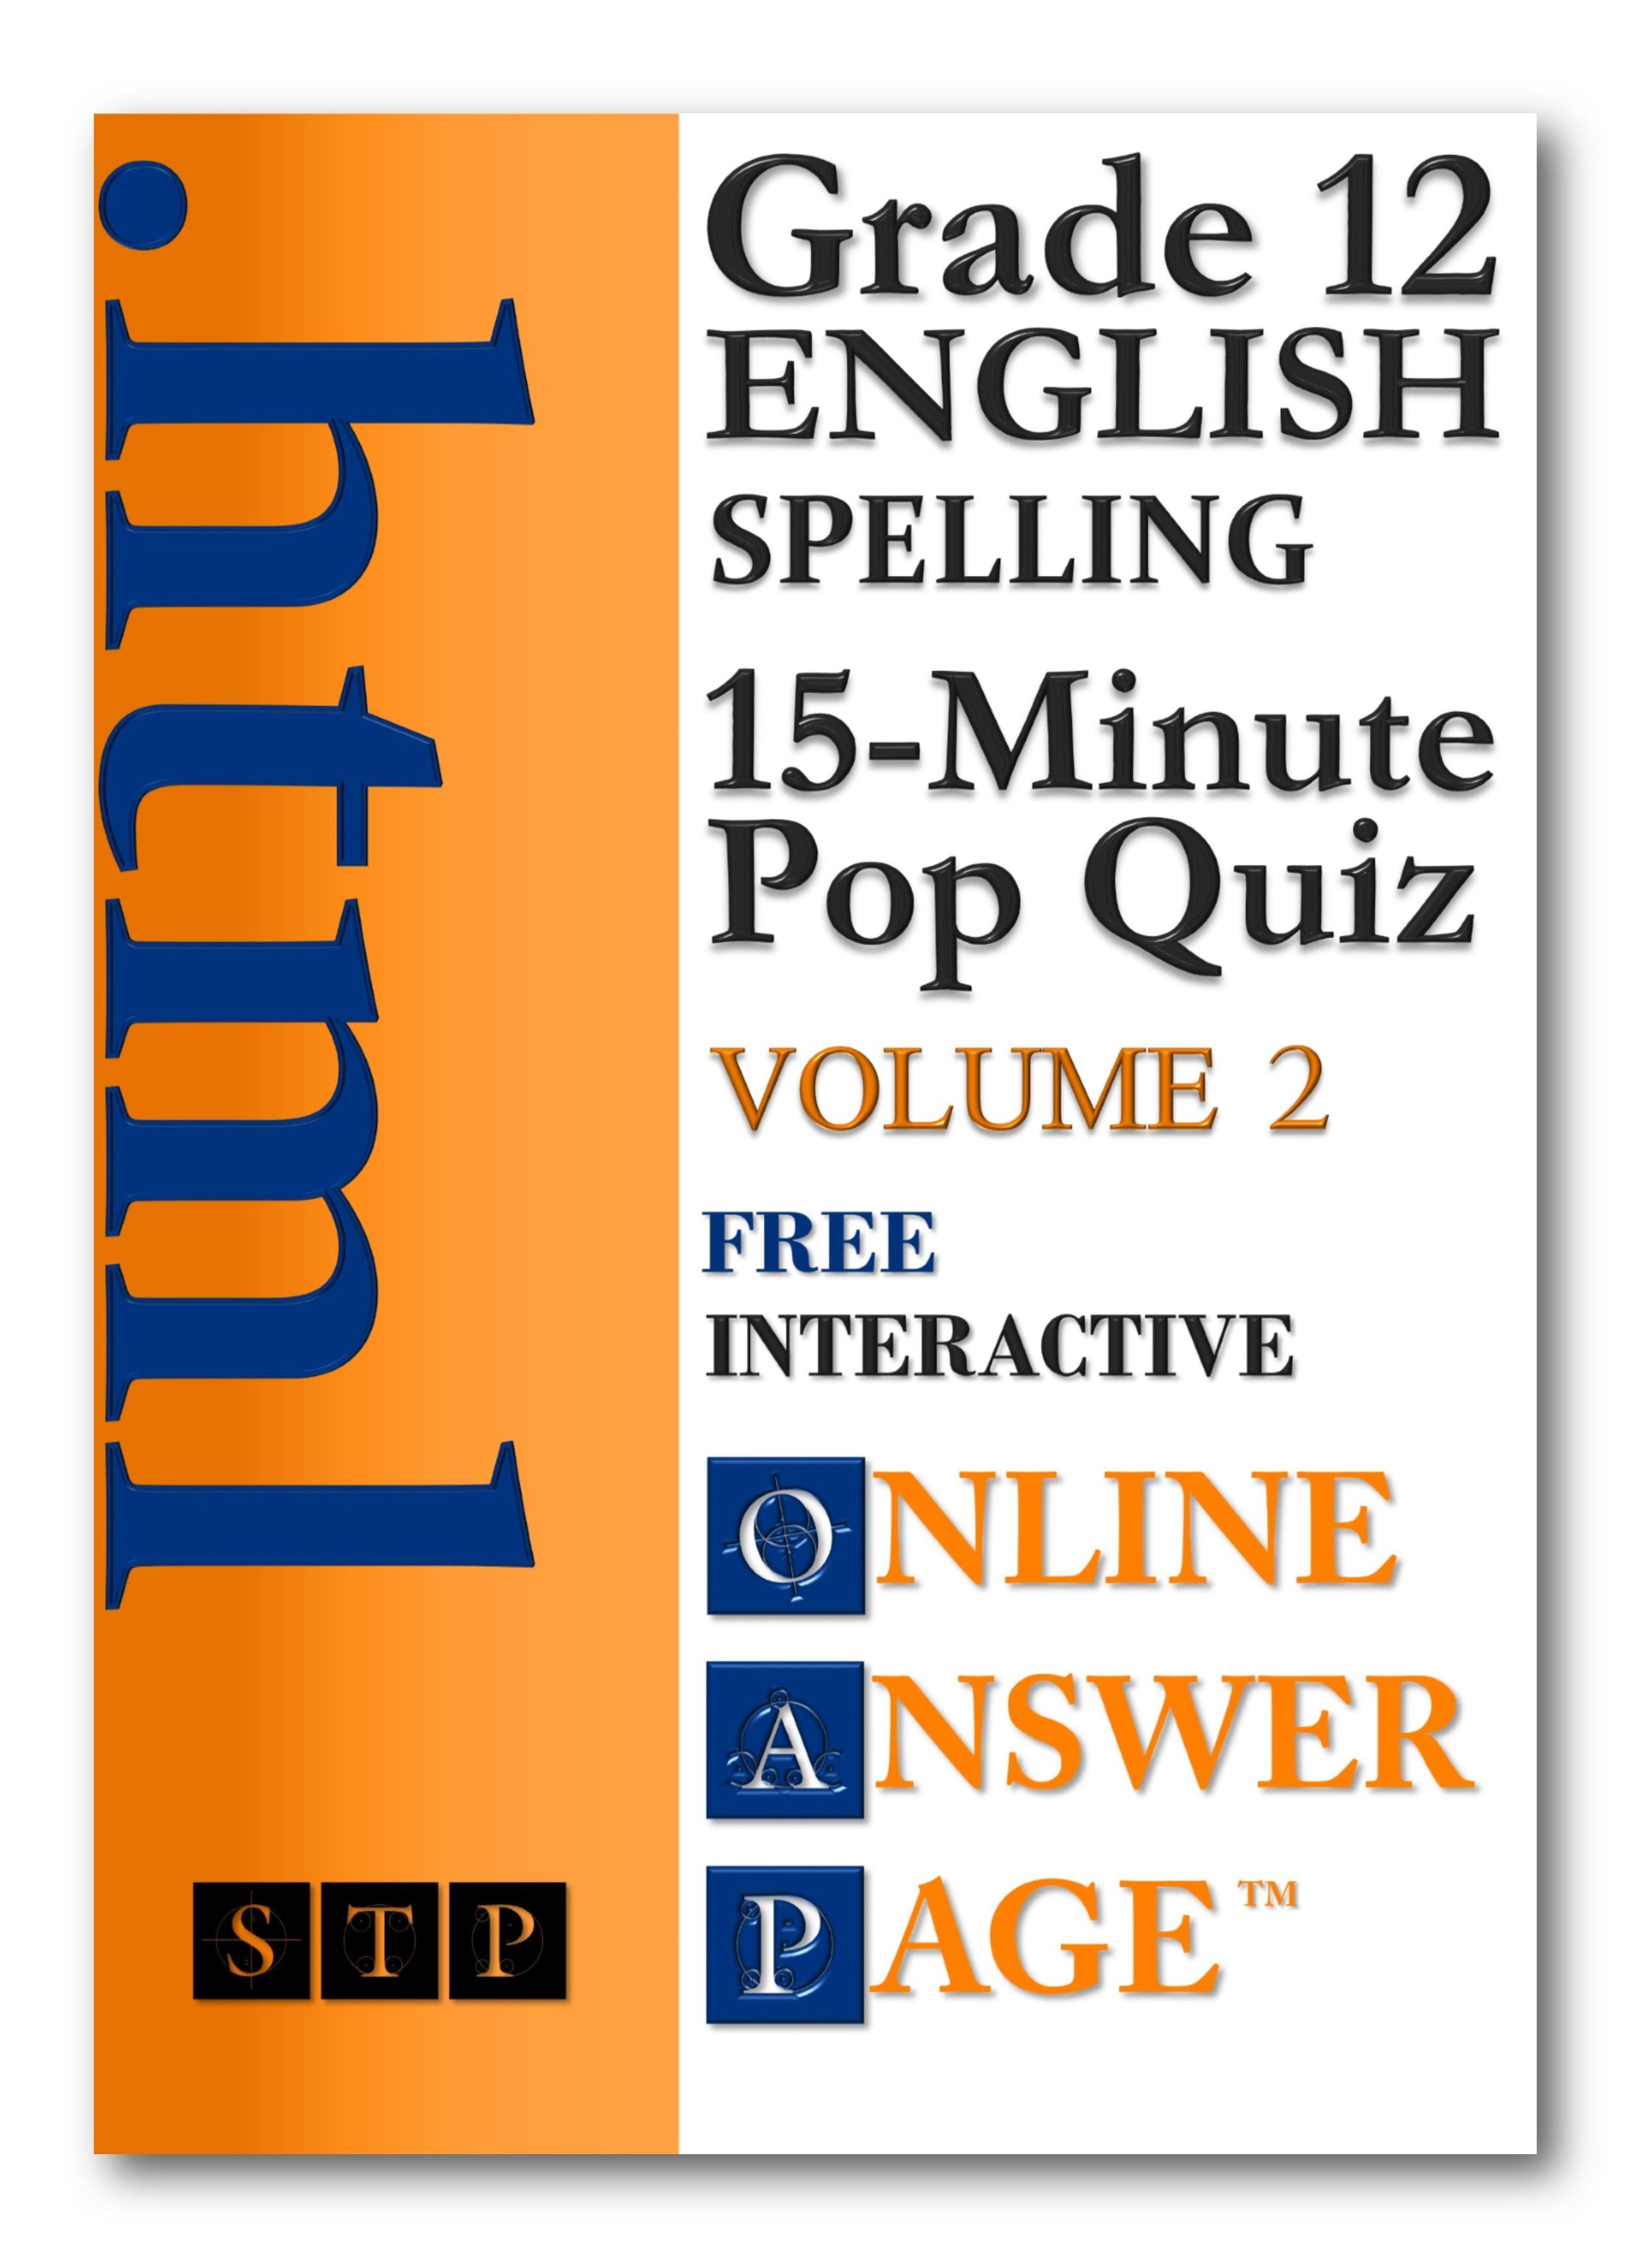 OAP Grade12 Spelling Vol.02 Gallery (11.12.15) 02.01.jpg